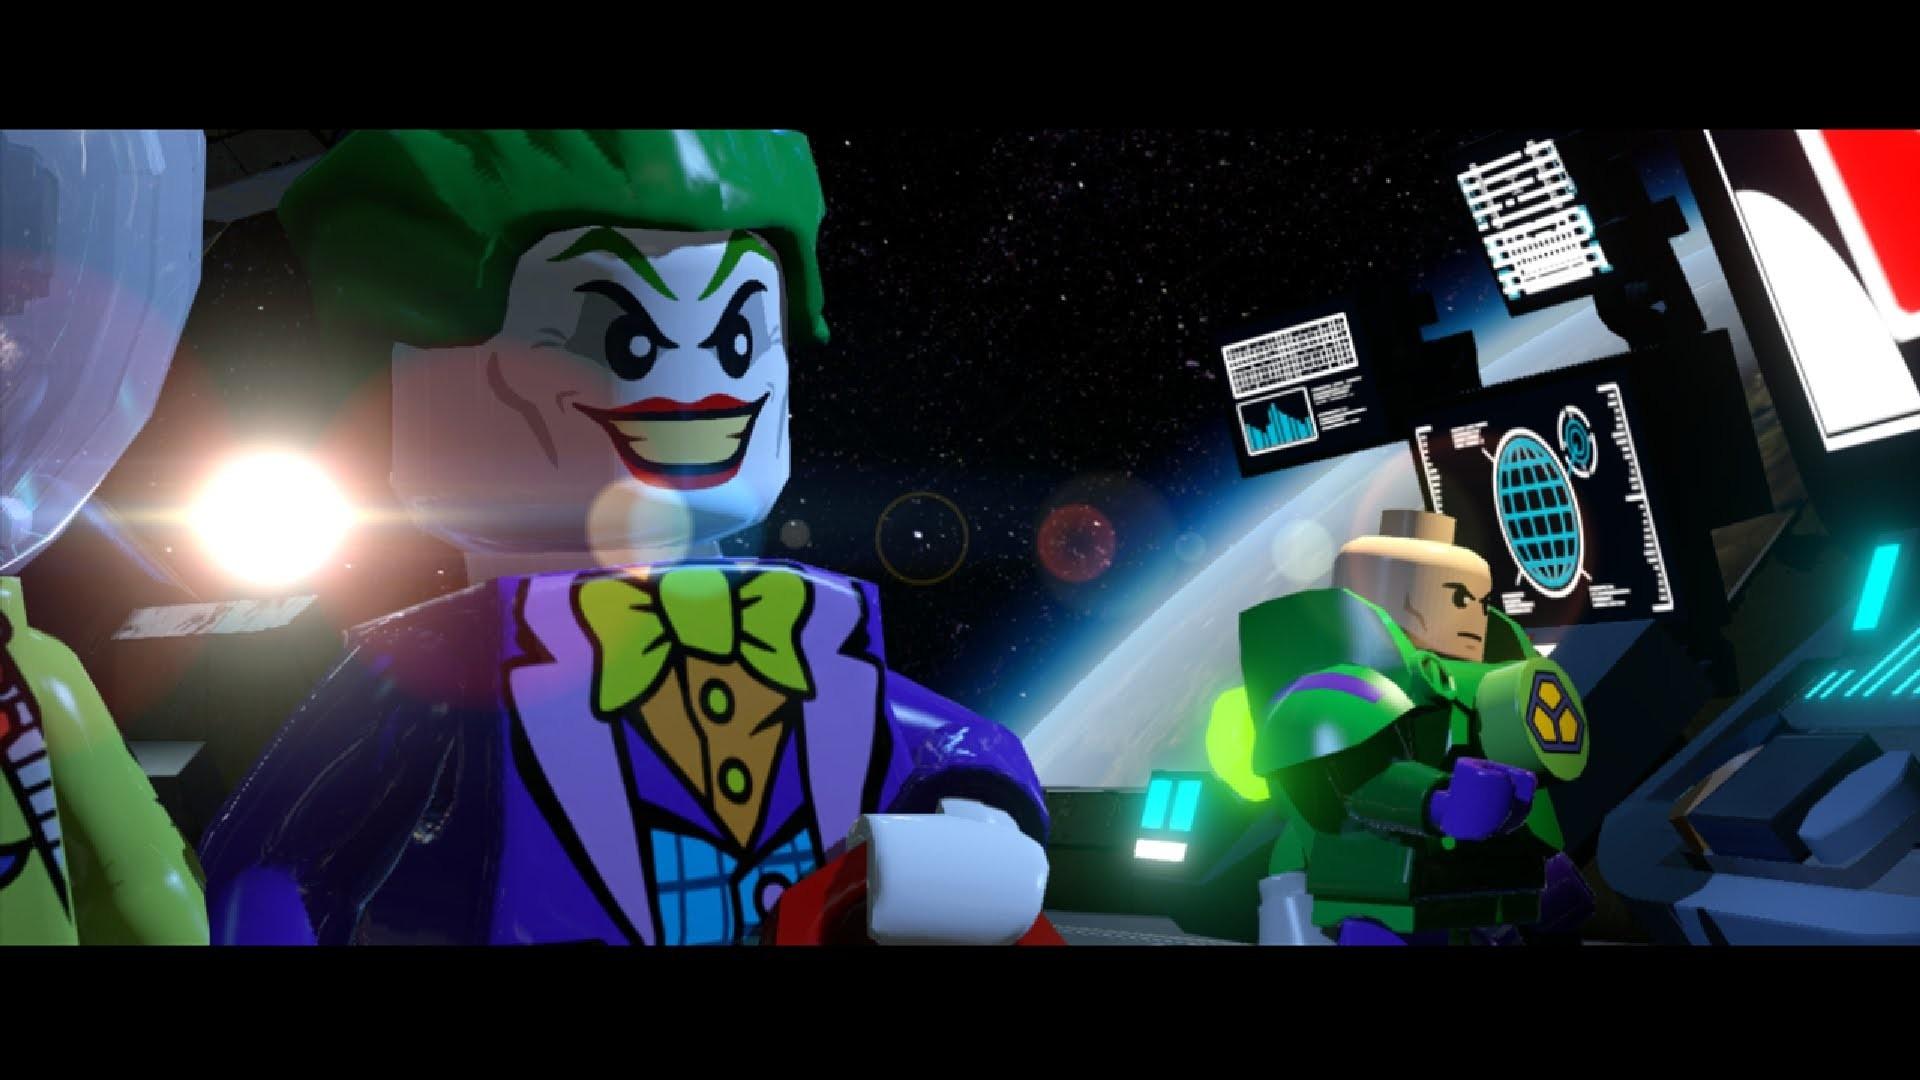 LEGO Batman 3: Beyond Gotham Weeping Angels Easter Egg